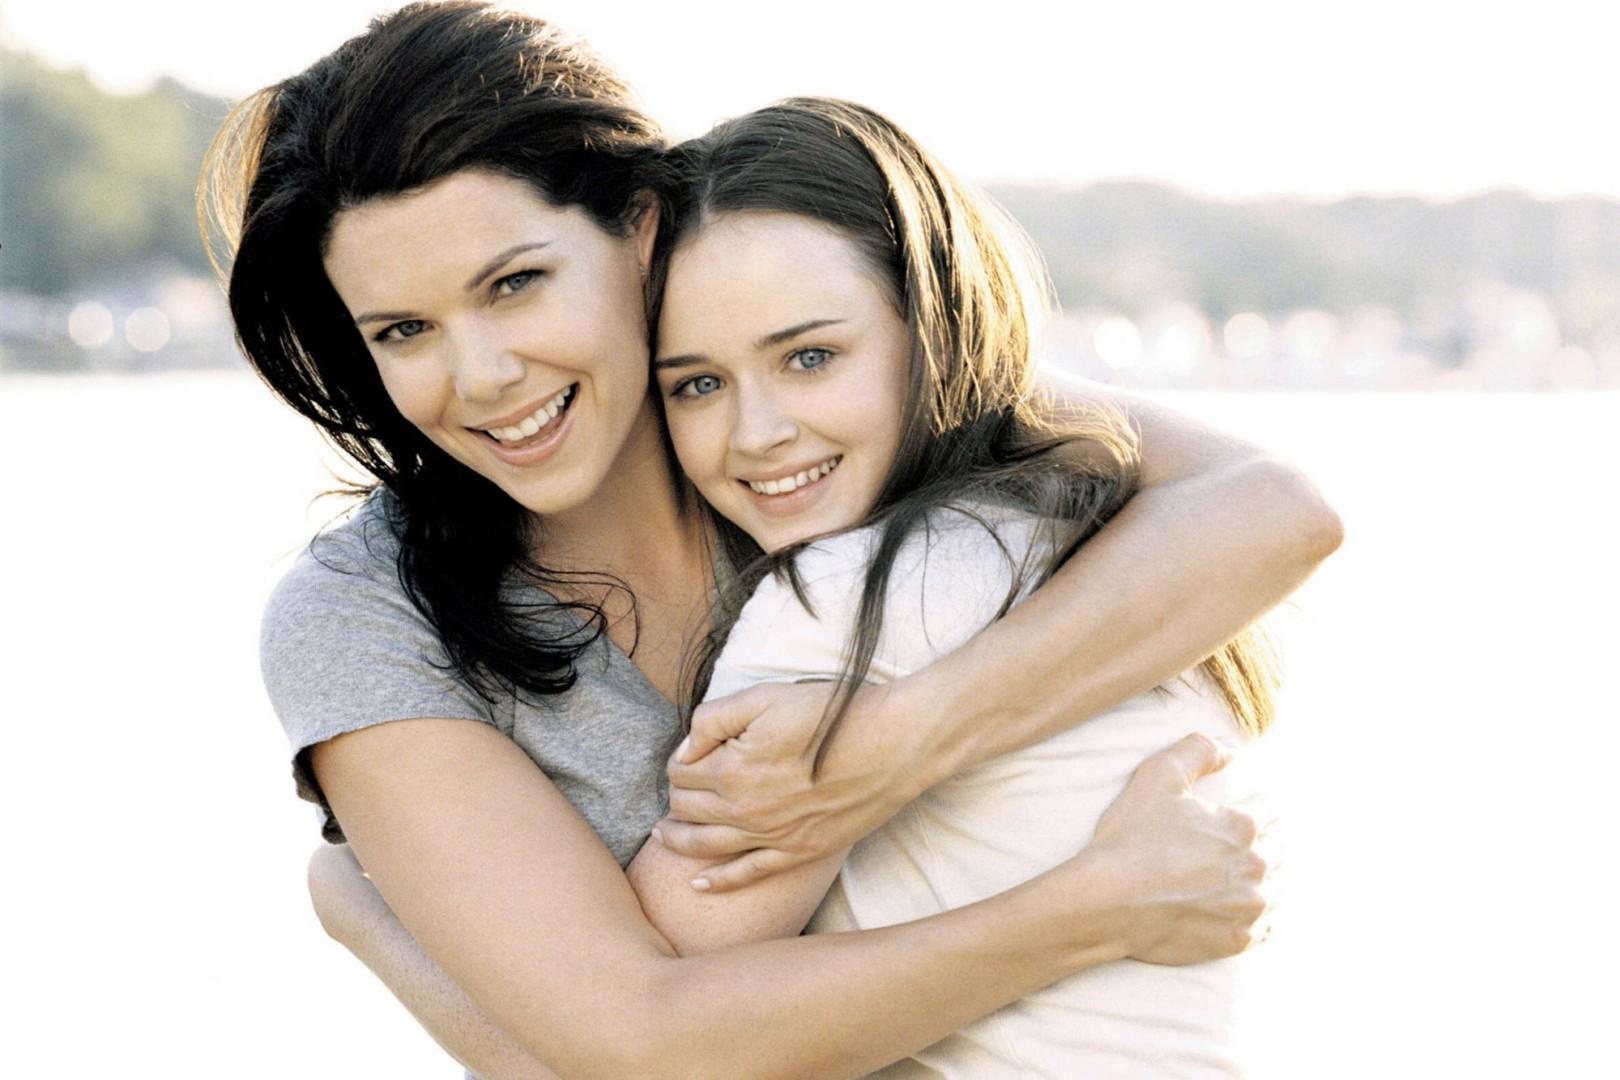 Мамаша и дочь дают молодому